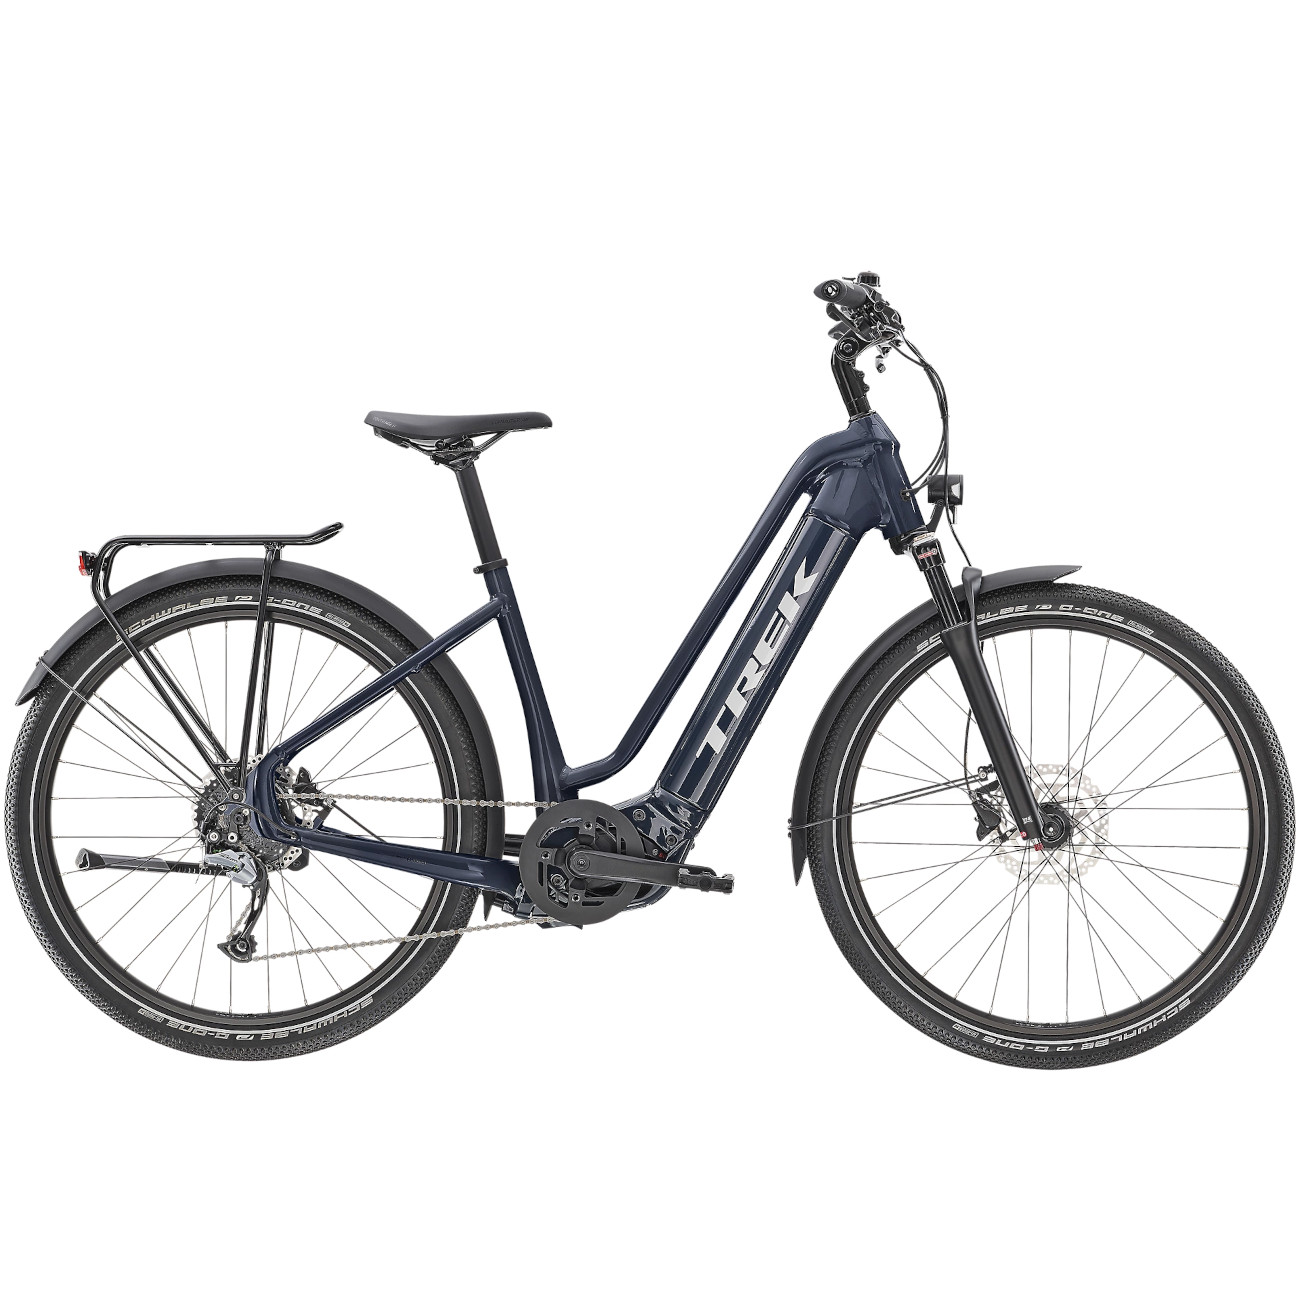 Trek Allant+ 7 Lowstep Tiefeinstieg E-Bike - 2022 - Nautical Navy